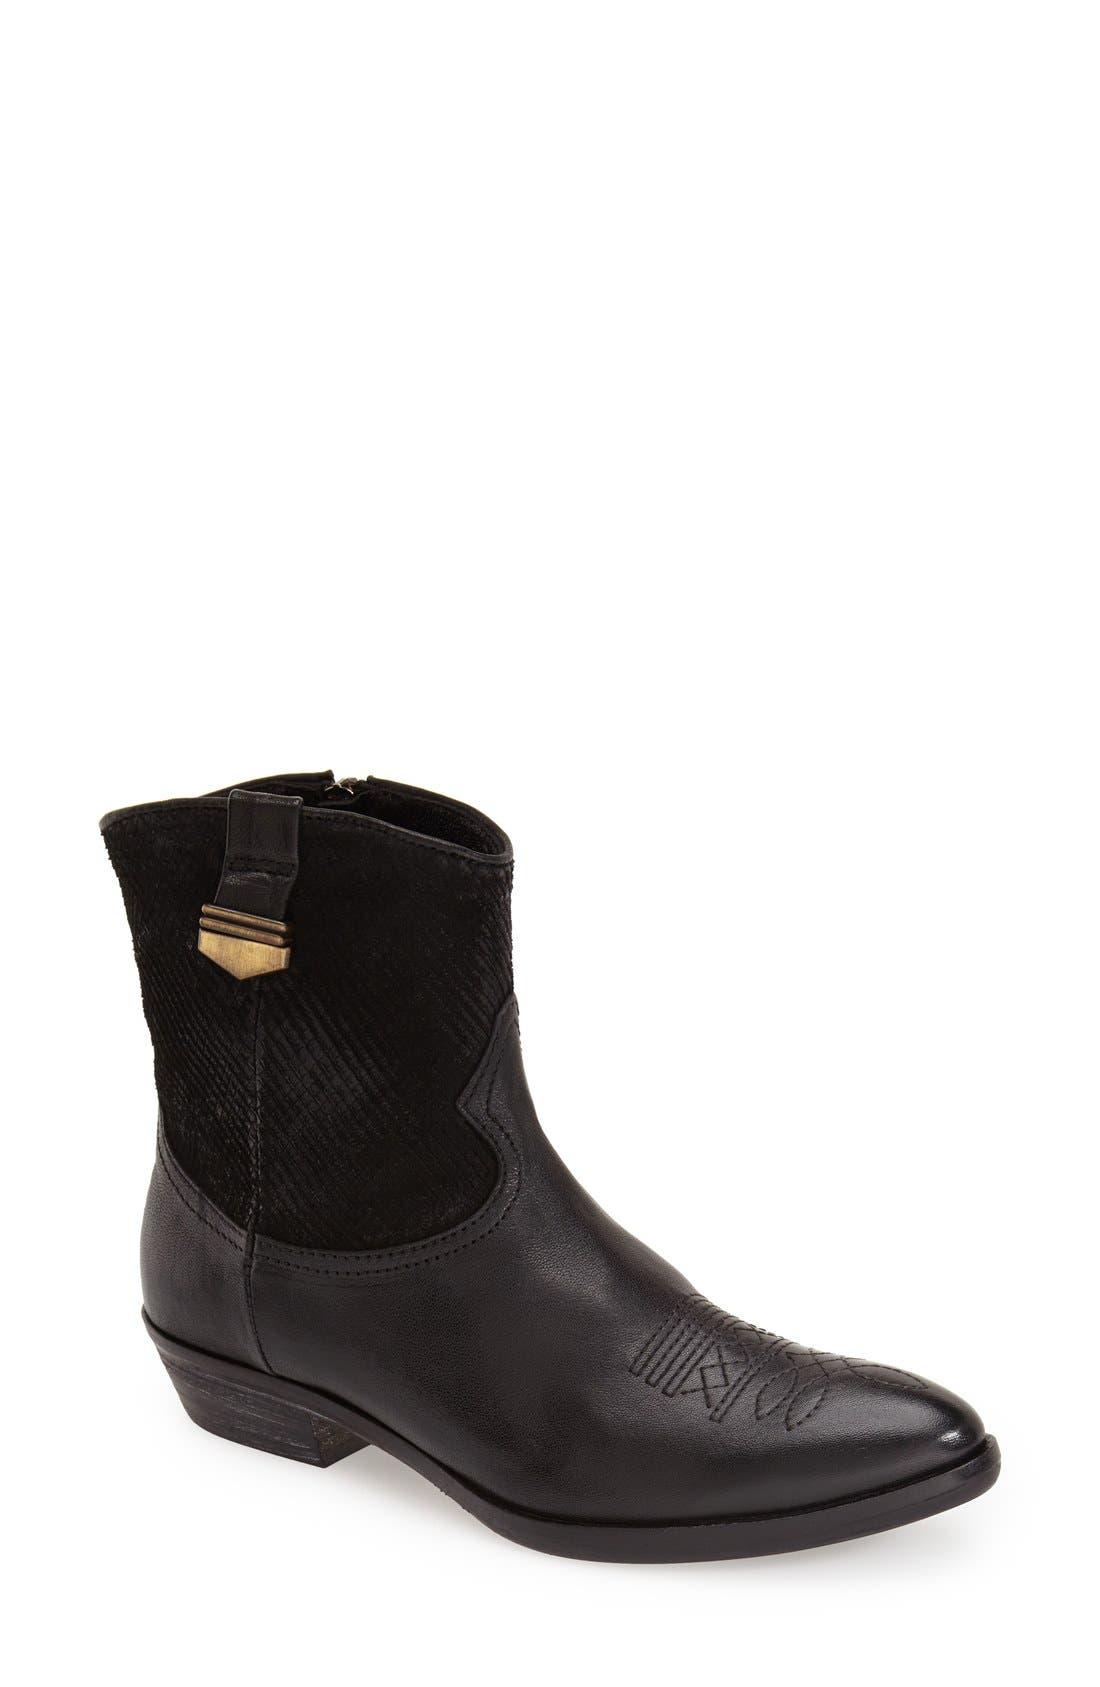 Alternate Image 1 Selected - KBR Flat Boot (Women)